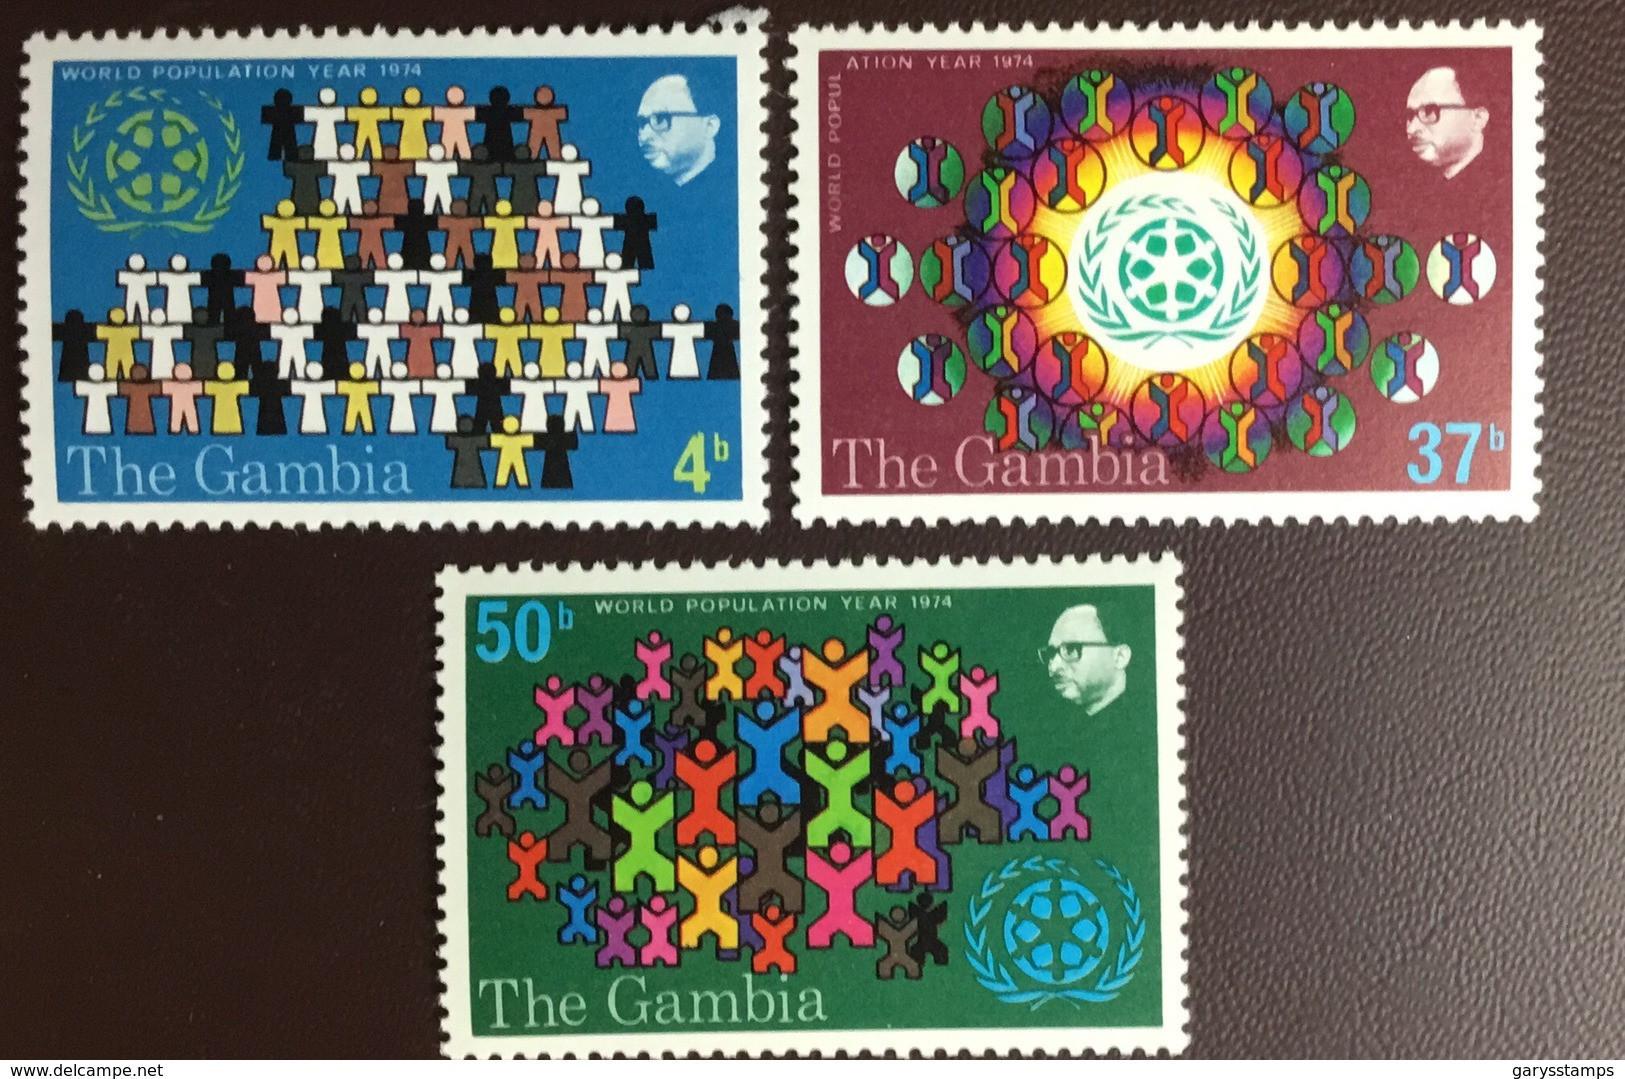 Gambia 1974 Population Year MNH - Gambia (1965-...)